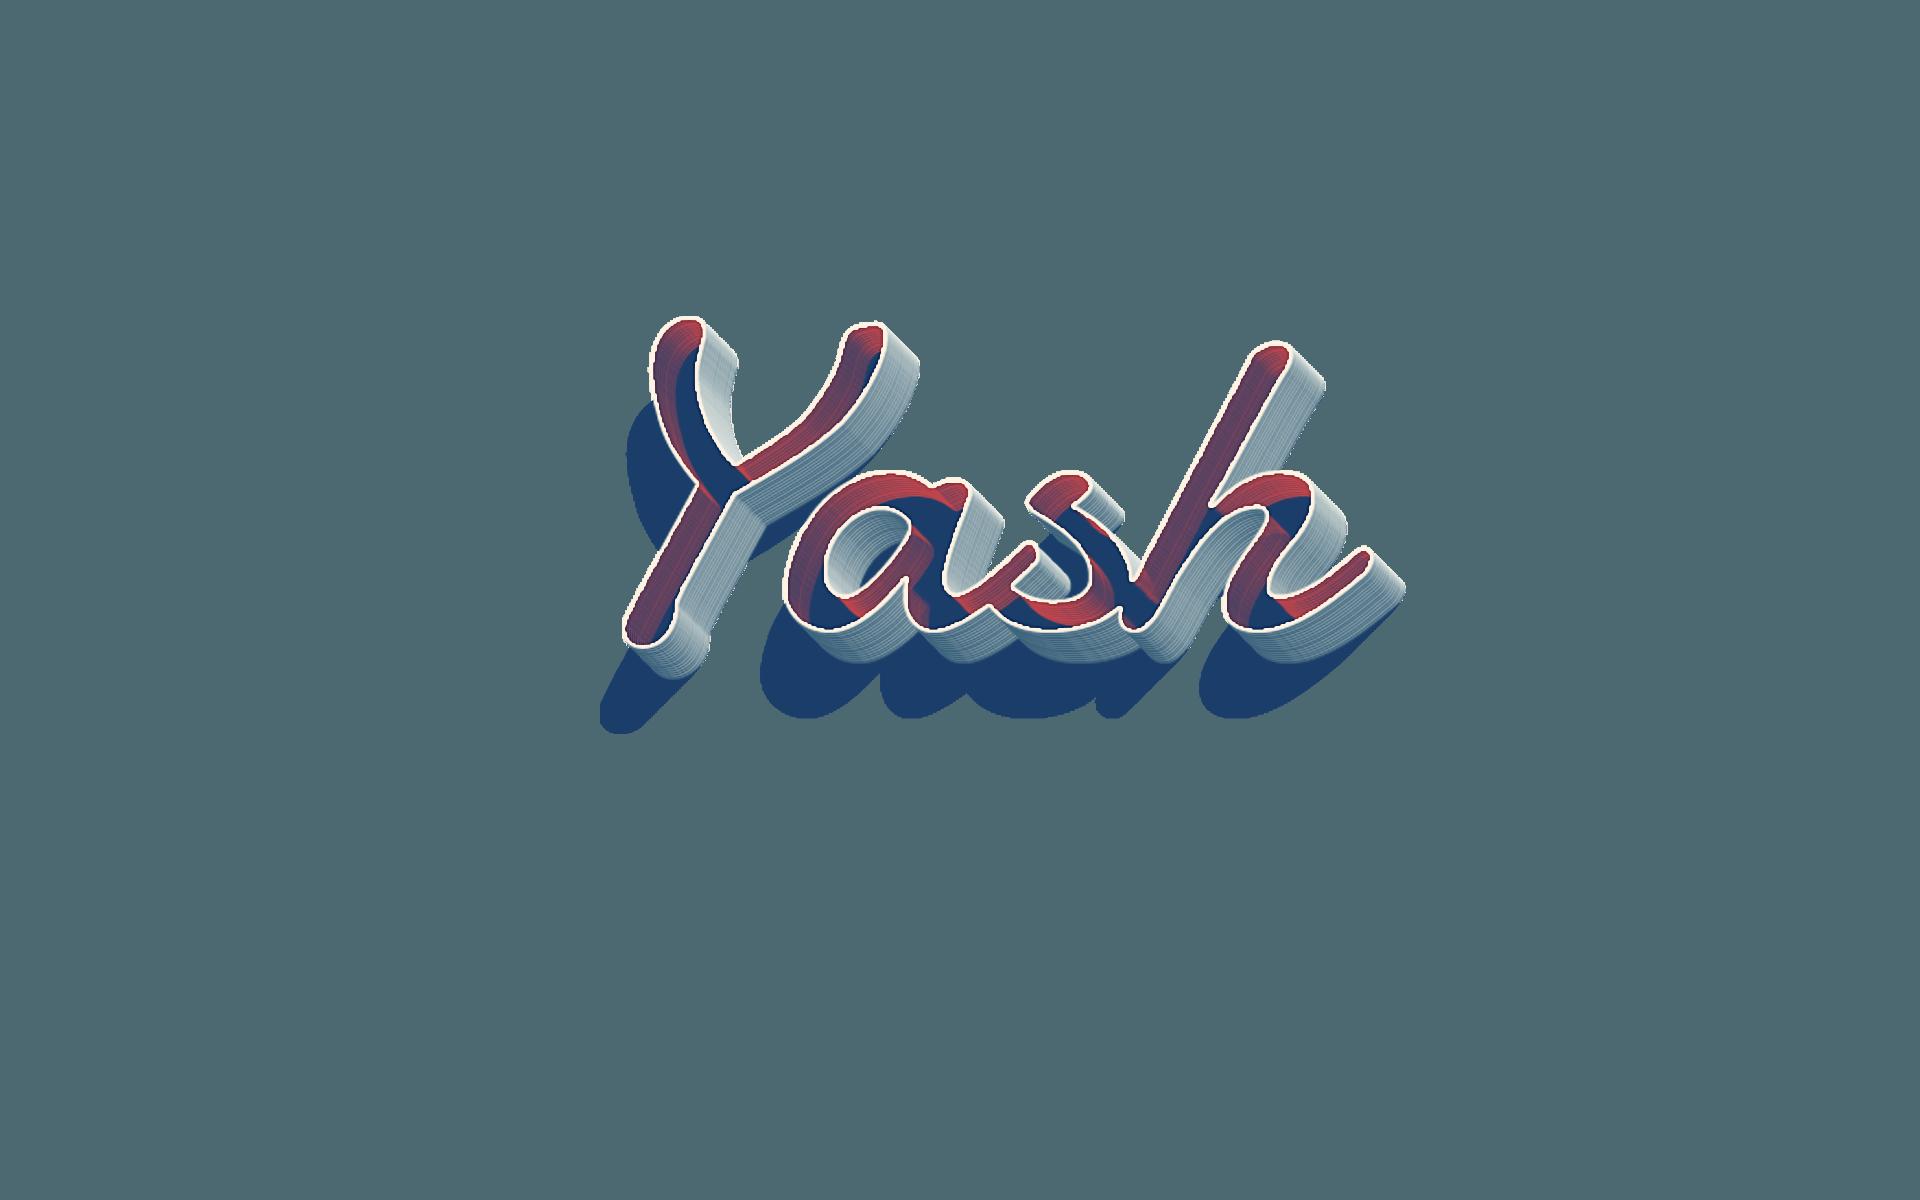 Popular Wallpaper Name Yash - wp2496731  You Should Have_28180.png